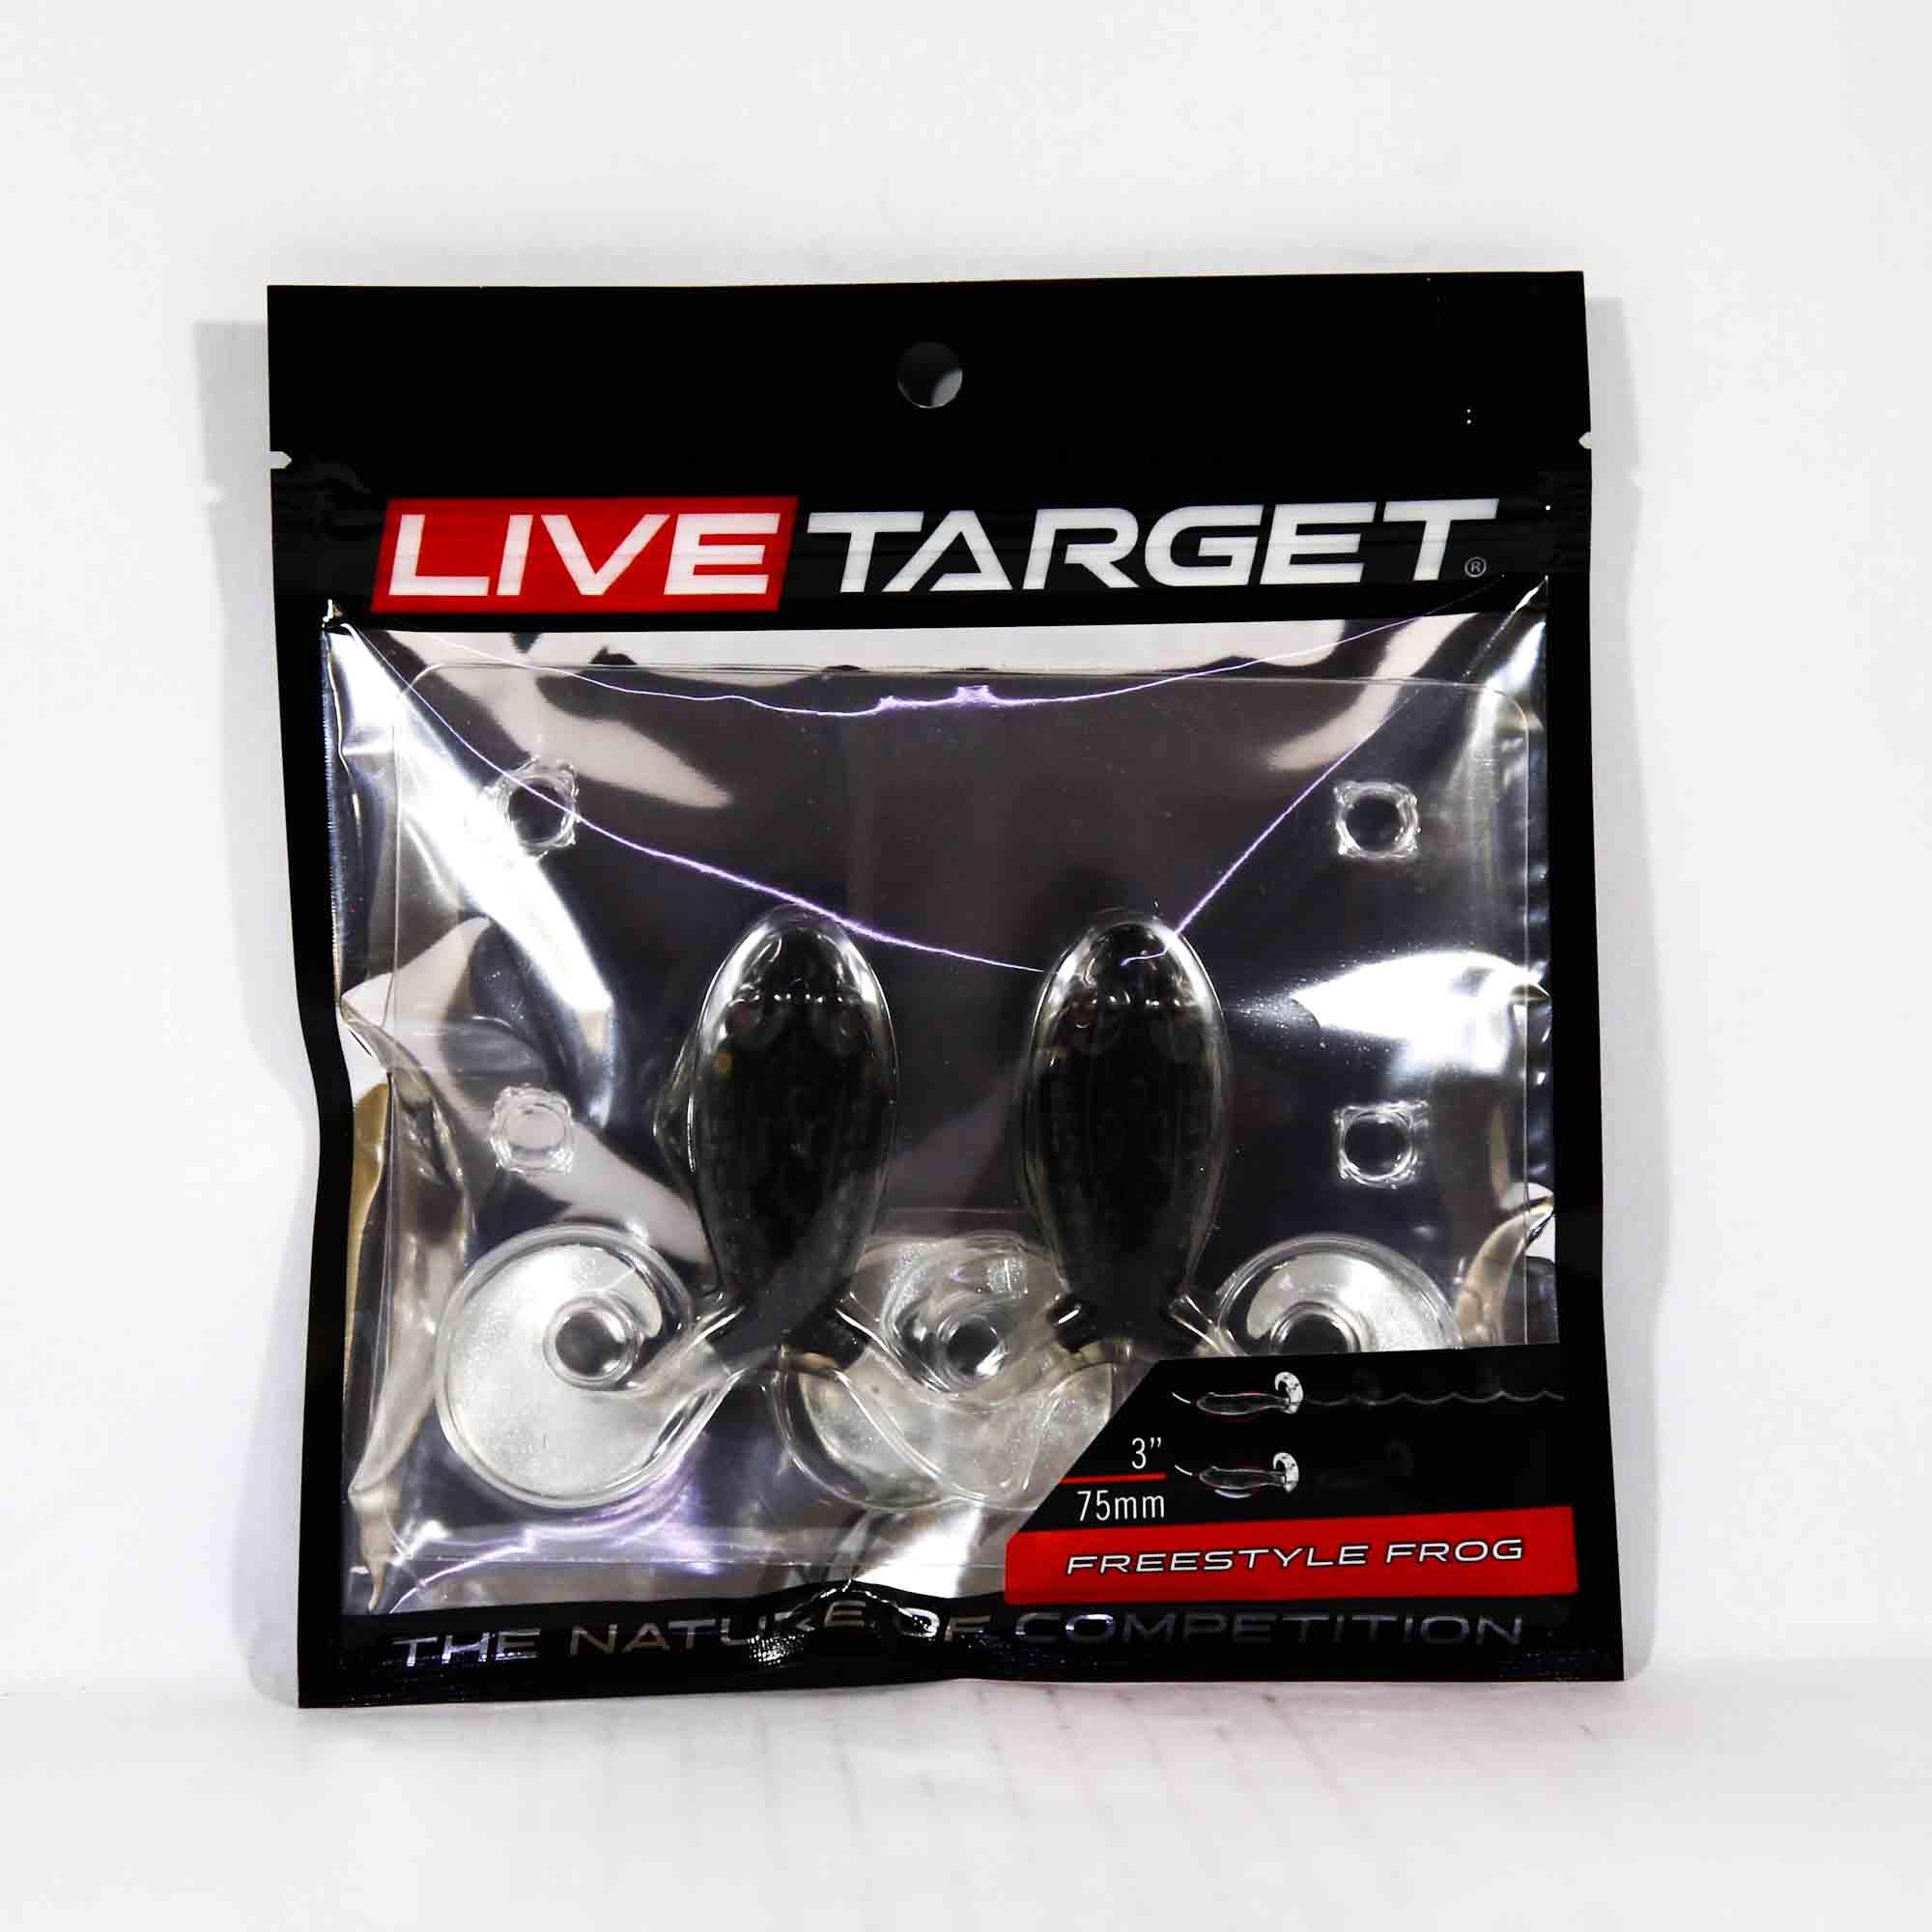 Live Target FSF75T517 Freestyle Frog 3 Inch Black Black (3729)